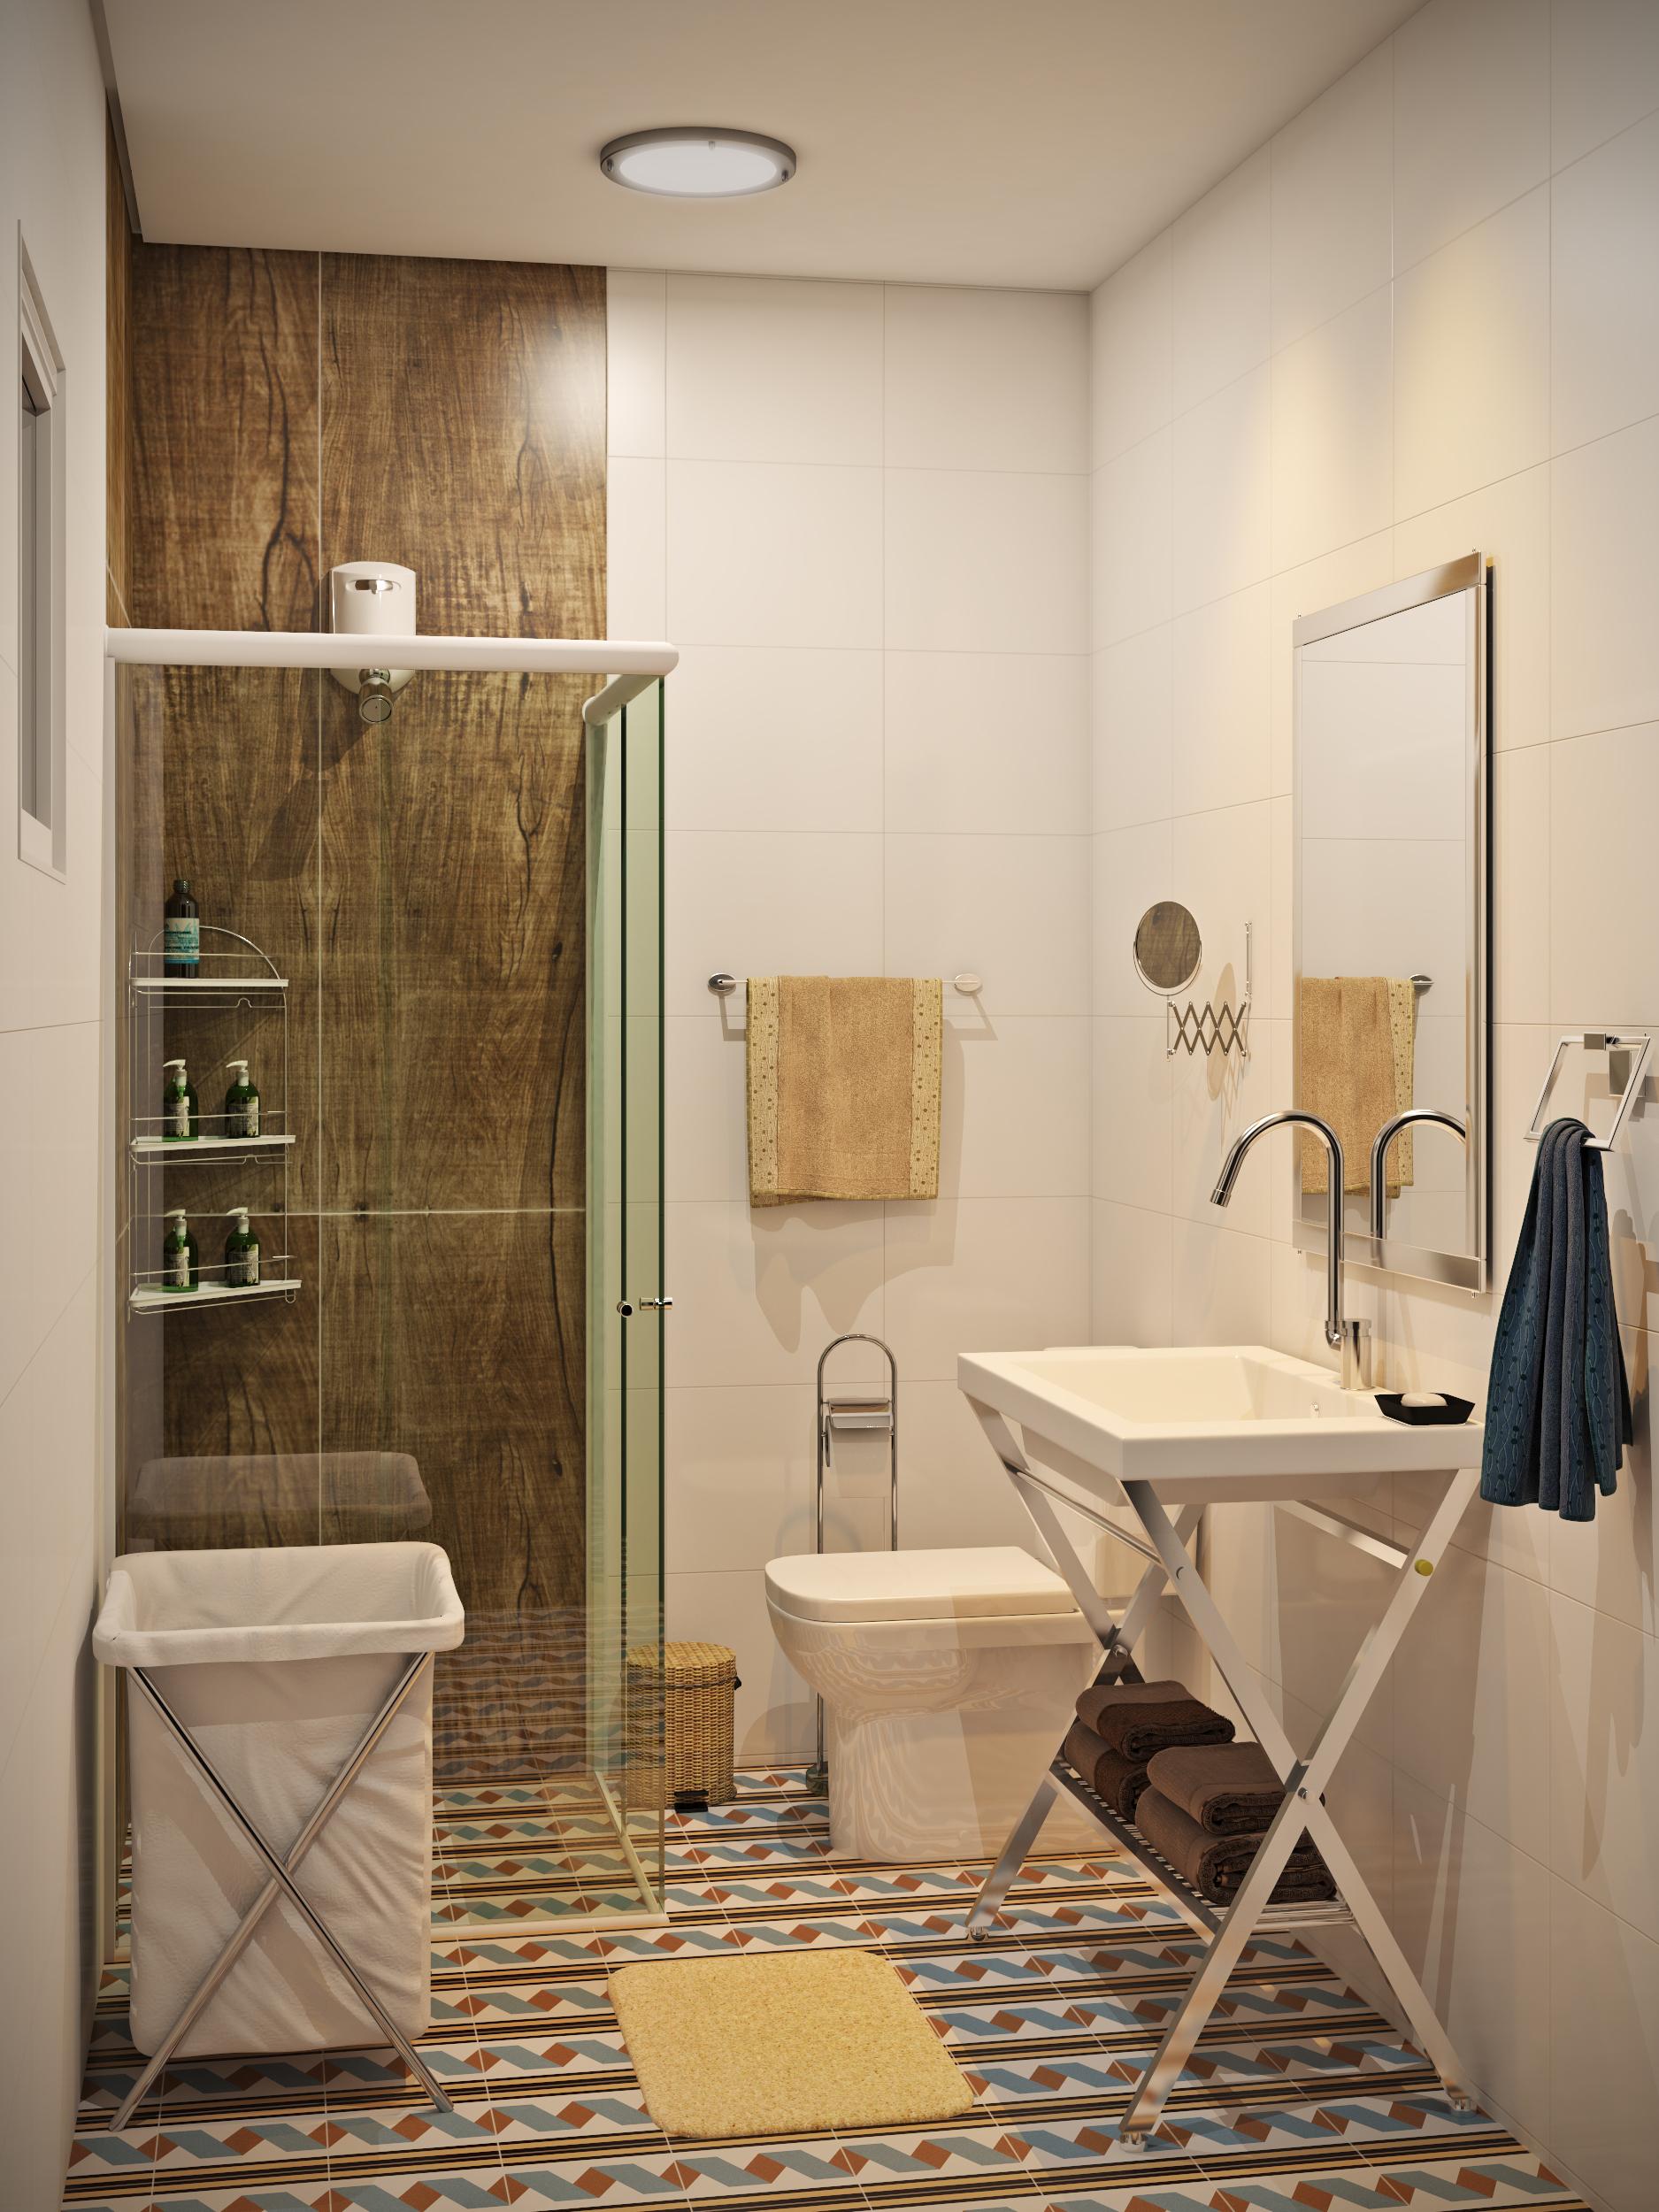 Banheiro de casal com piso estampado leroy merlin - Amueblar piso pequeno barato ...